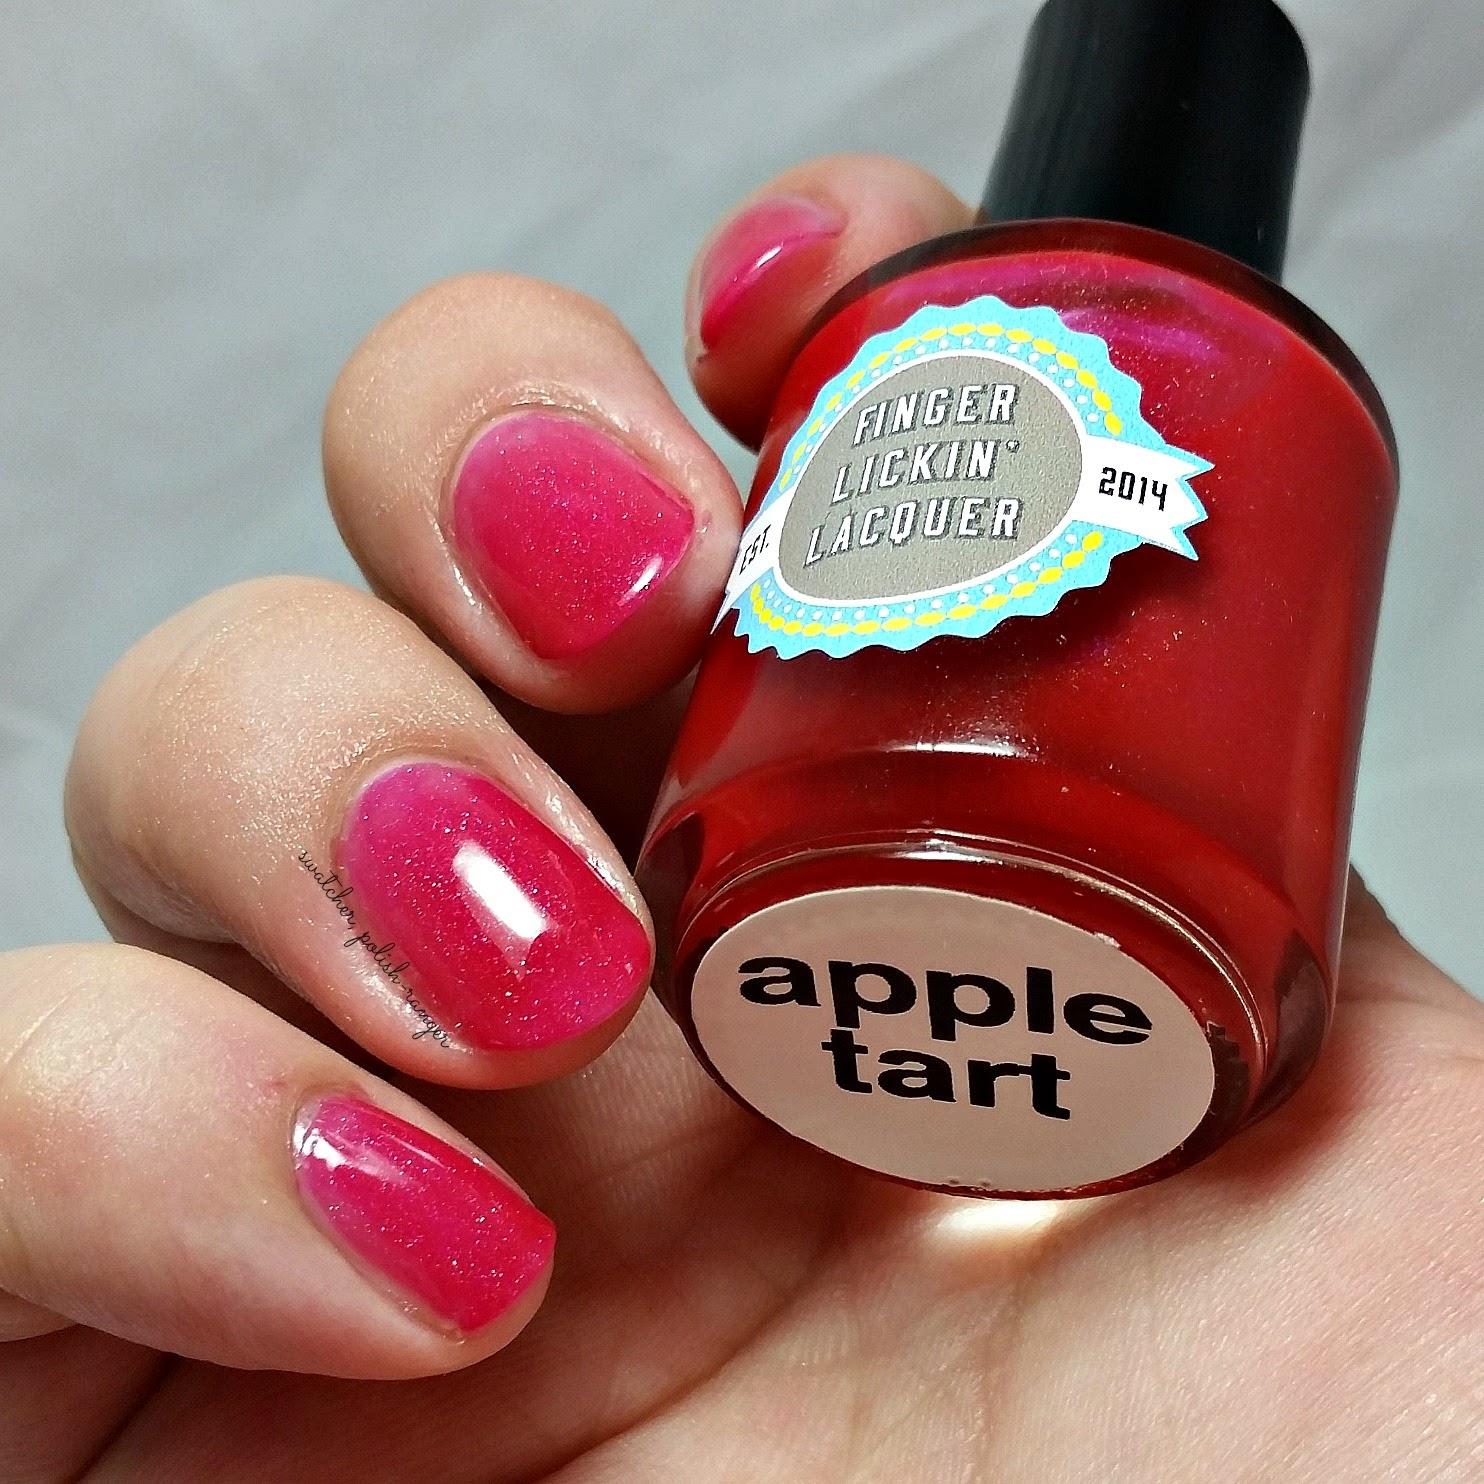 Finger Lickin' Lacquer Apple Tart swatch